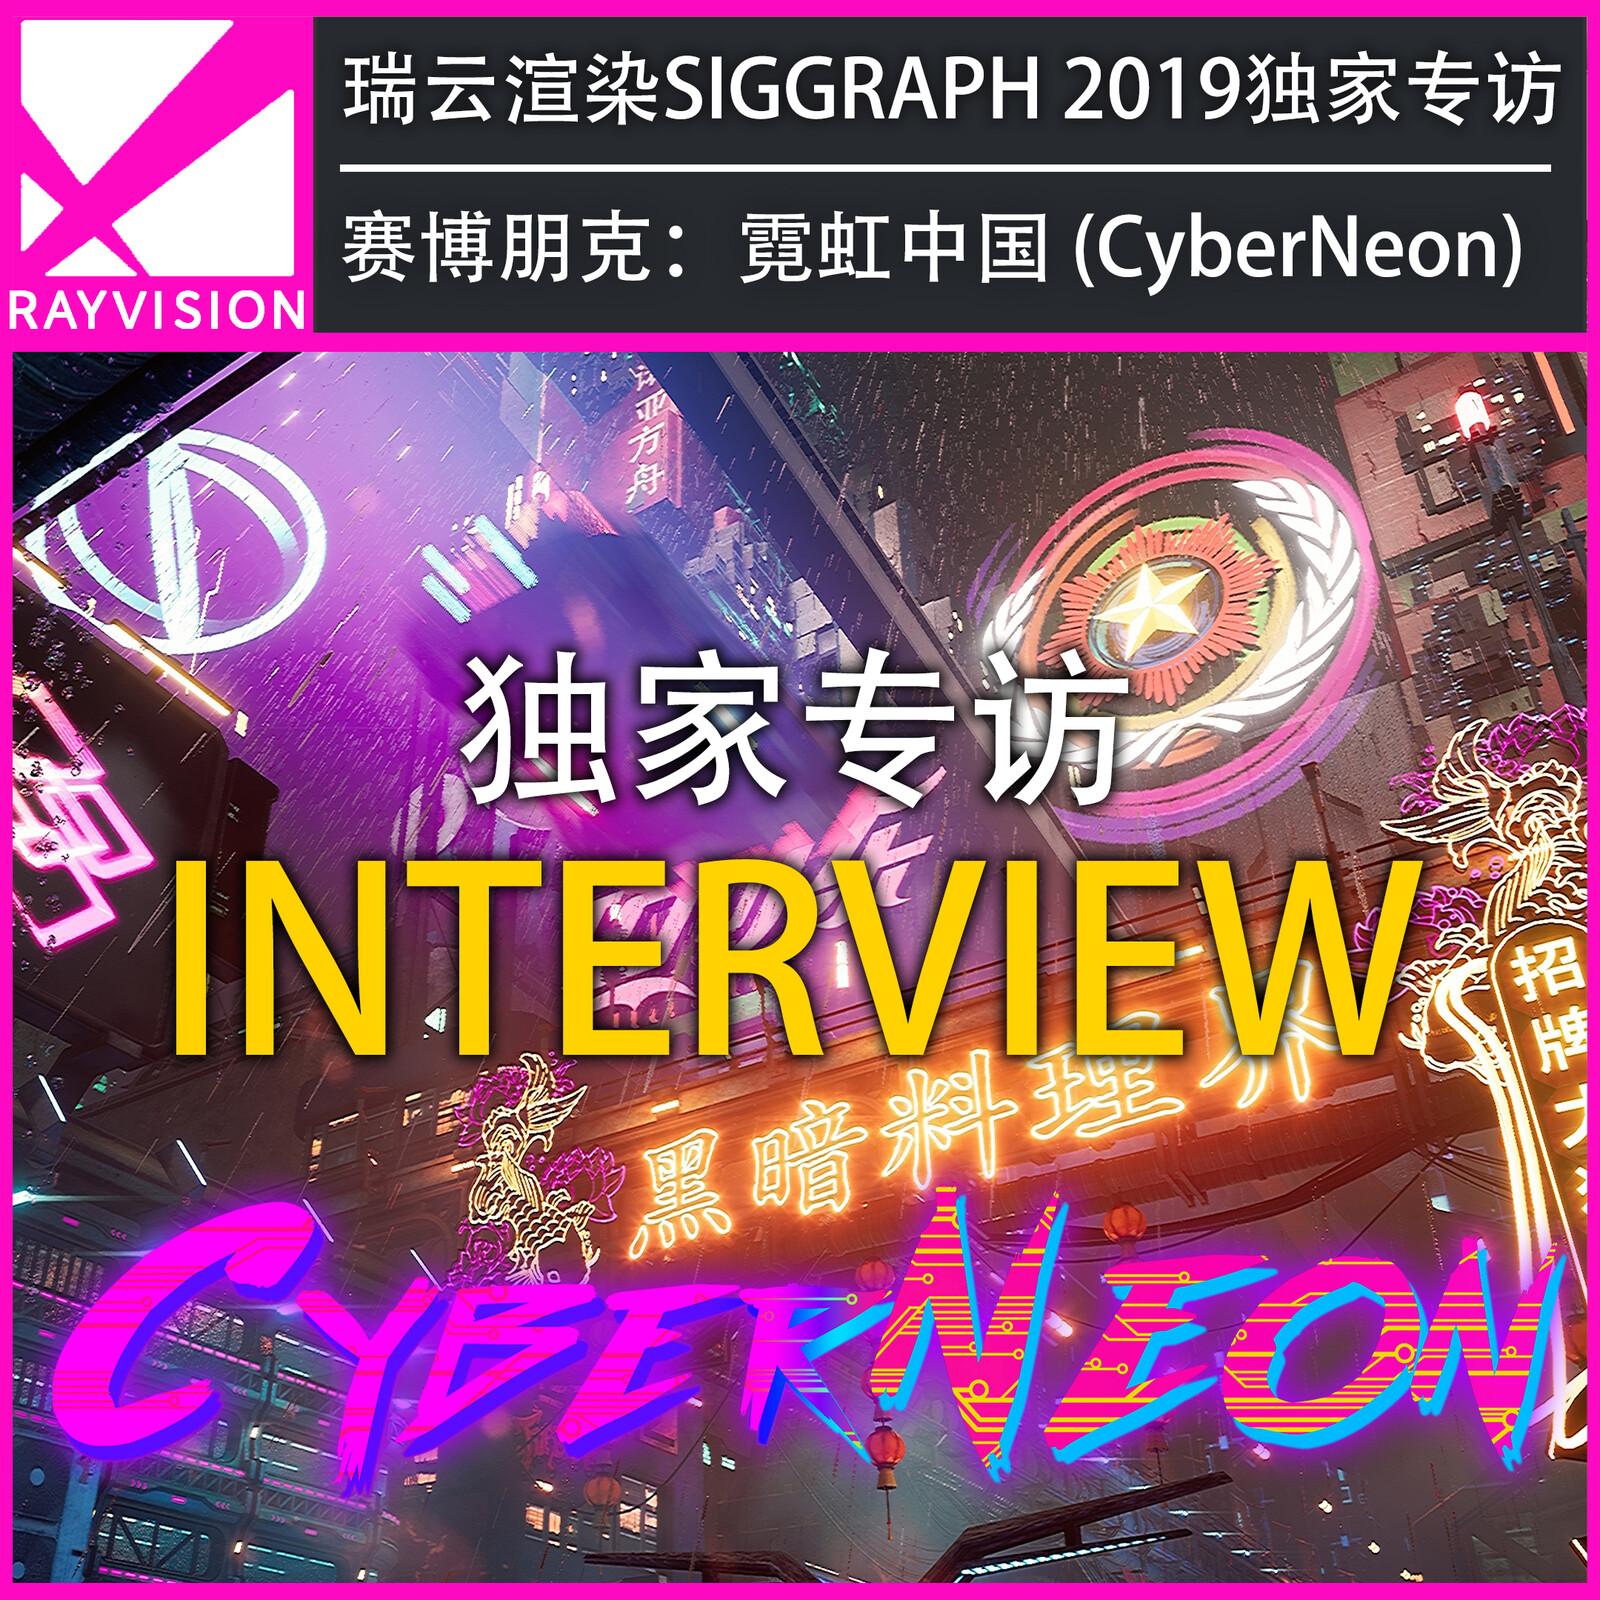 瑞云渲染(RAYVISION) Siggraph 2019 独家专访(Exclusive Interview) - 赛博朋克: 霓虹中国(CyberNeon)